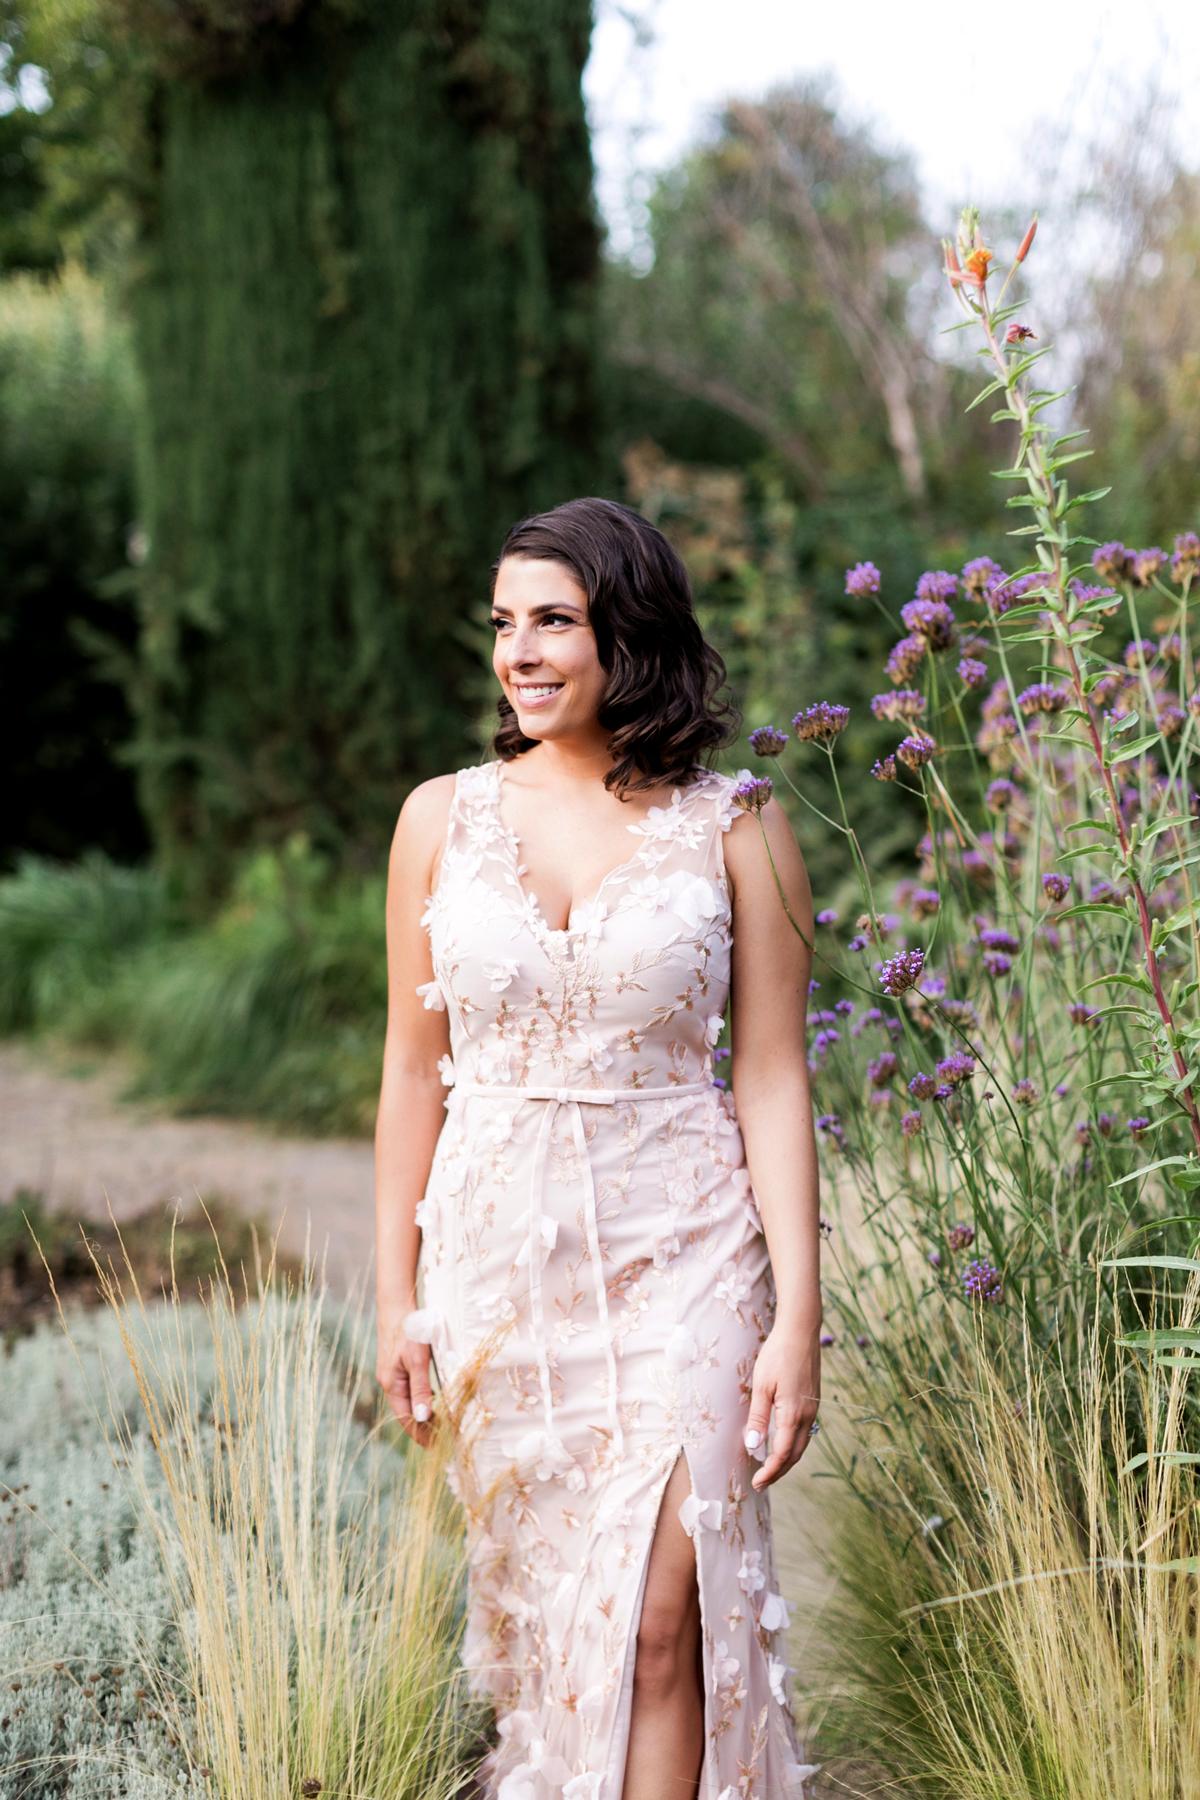 bride wearing blush-colored, 3D floral appliquéd, sleeveless, side-slit, think bow belt, floor length gown